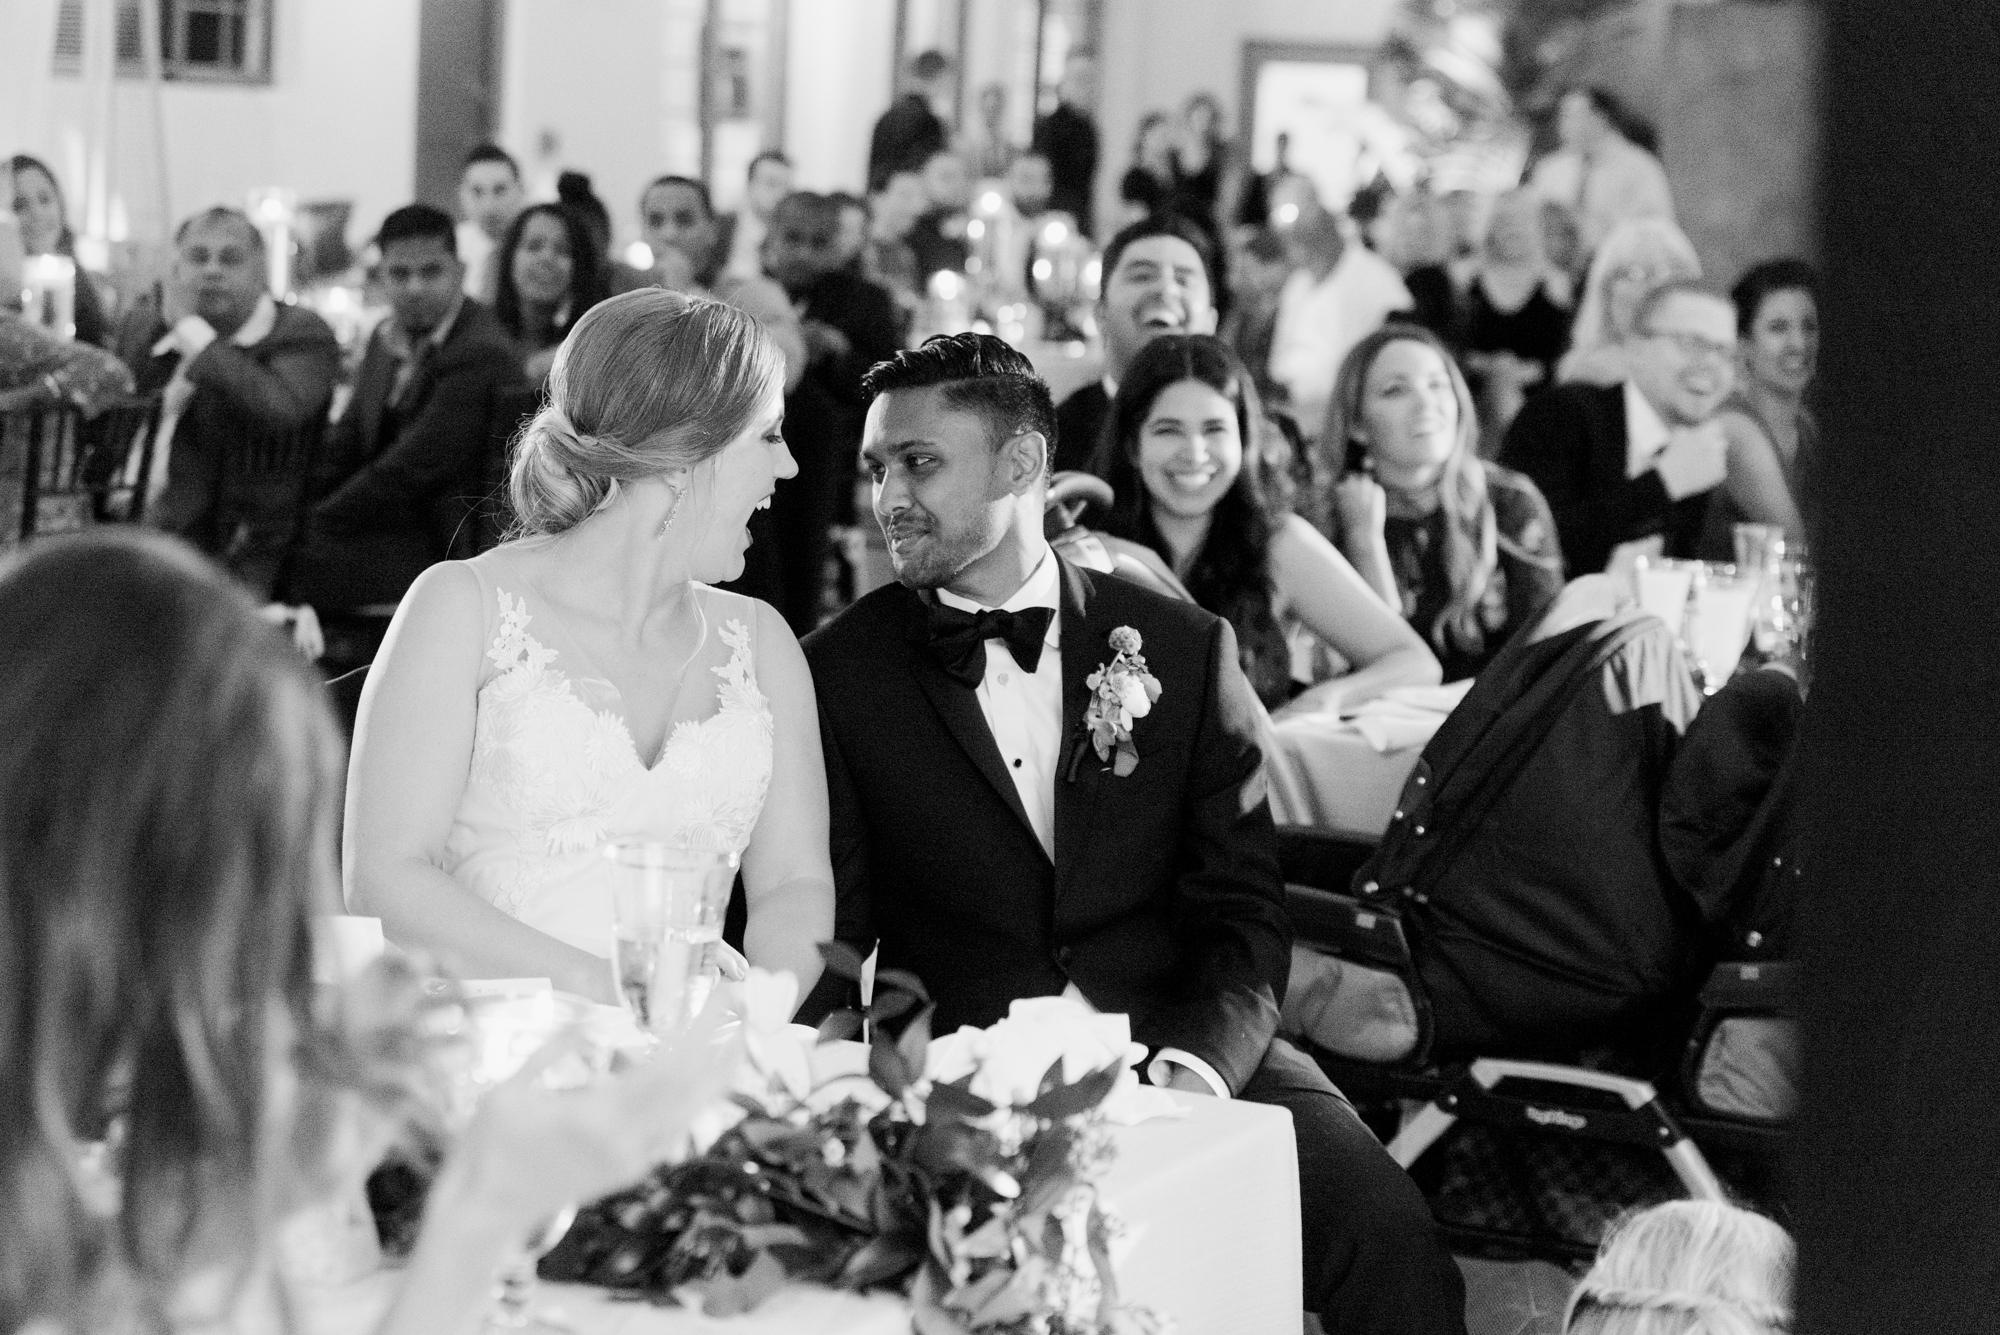 betsy-hotel-wedding-south-beach-miami-charleston-south-carolina-destination-wedding-photographer-32.jpg